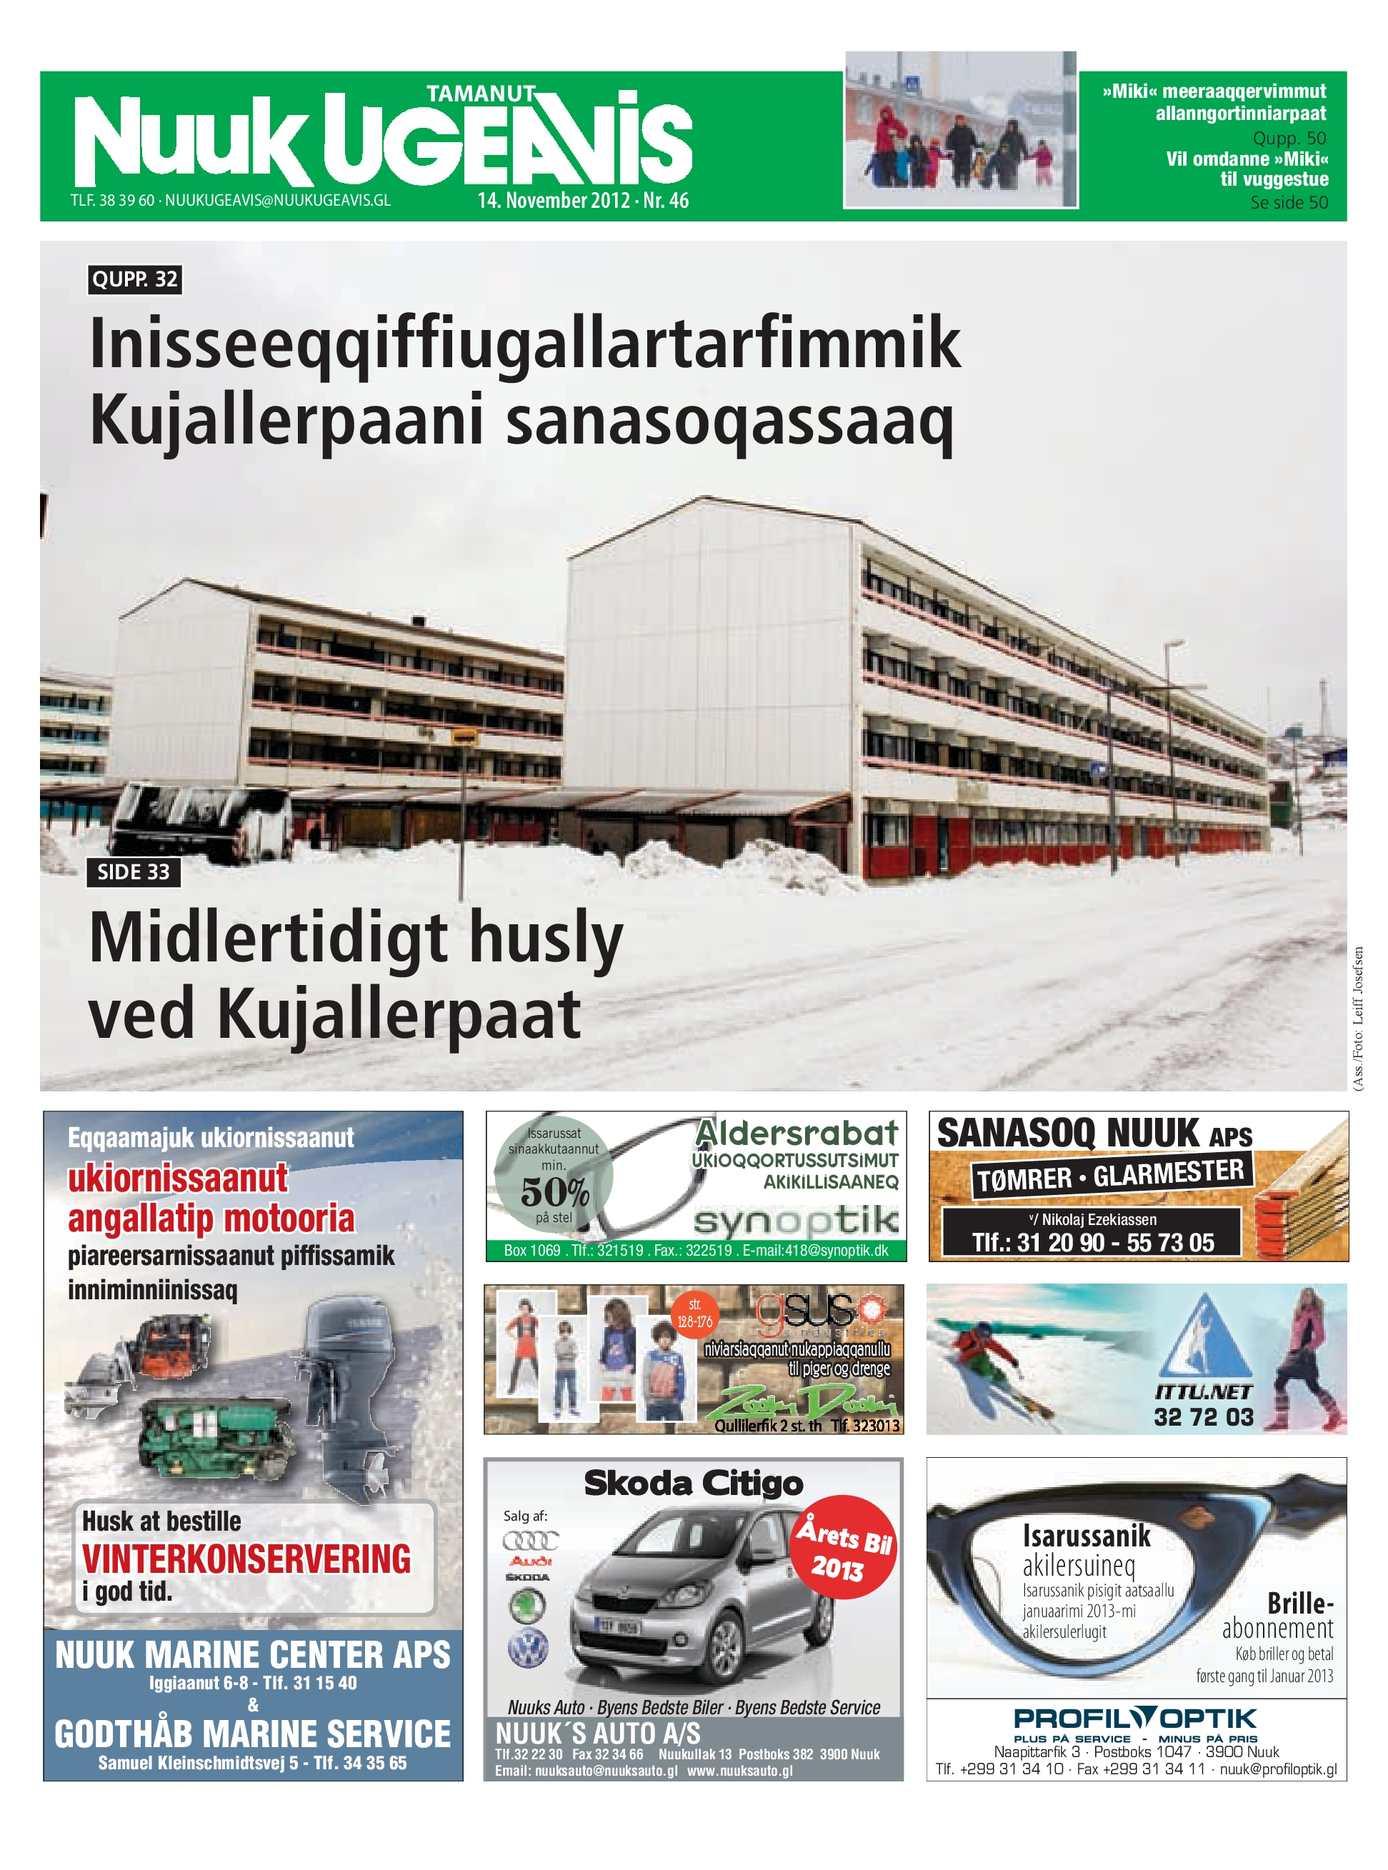 b3e6c45c Calaméo - Nuuk Ugeavis Uge 46_2012